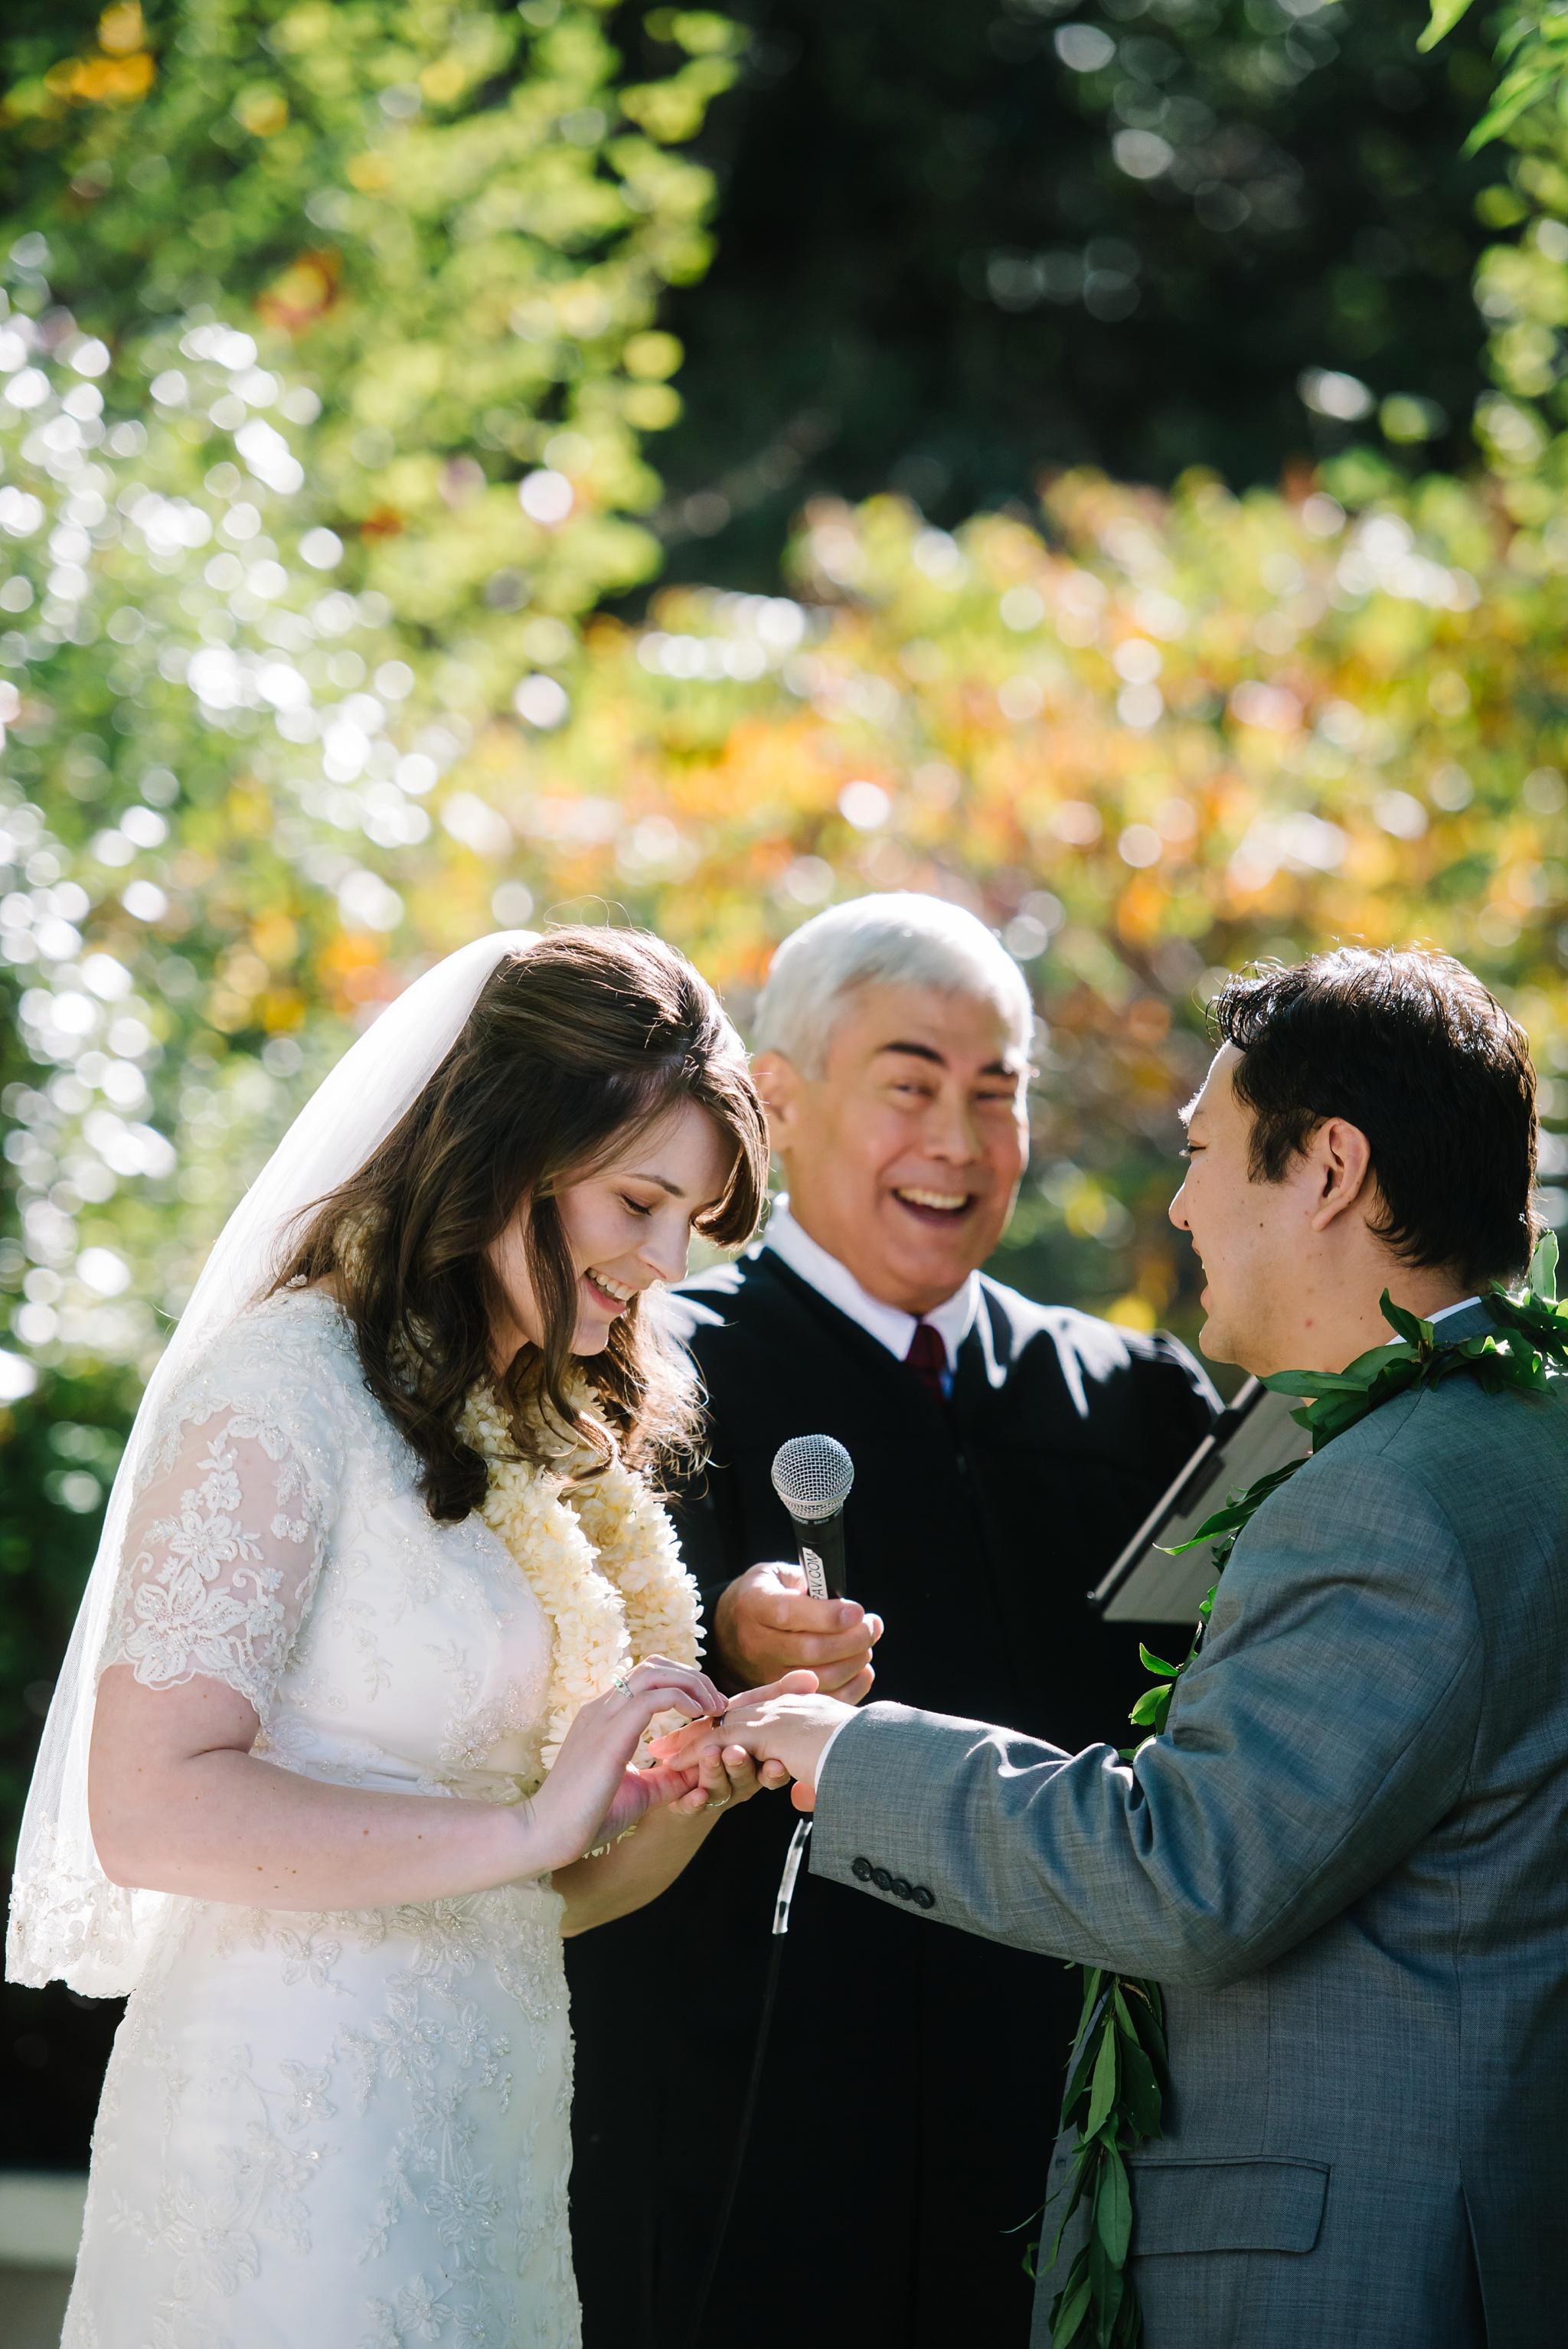 Park City Wedding Photographer Ali Sumsion 043